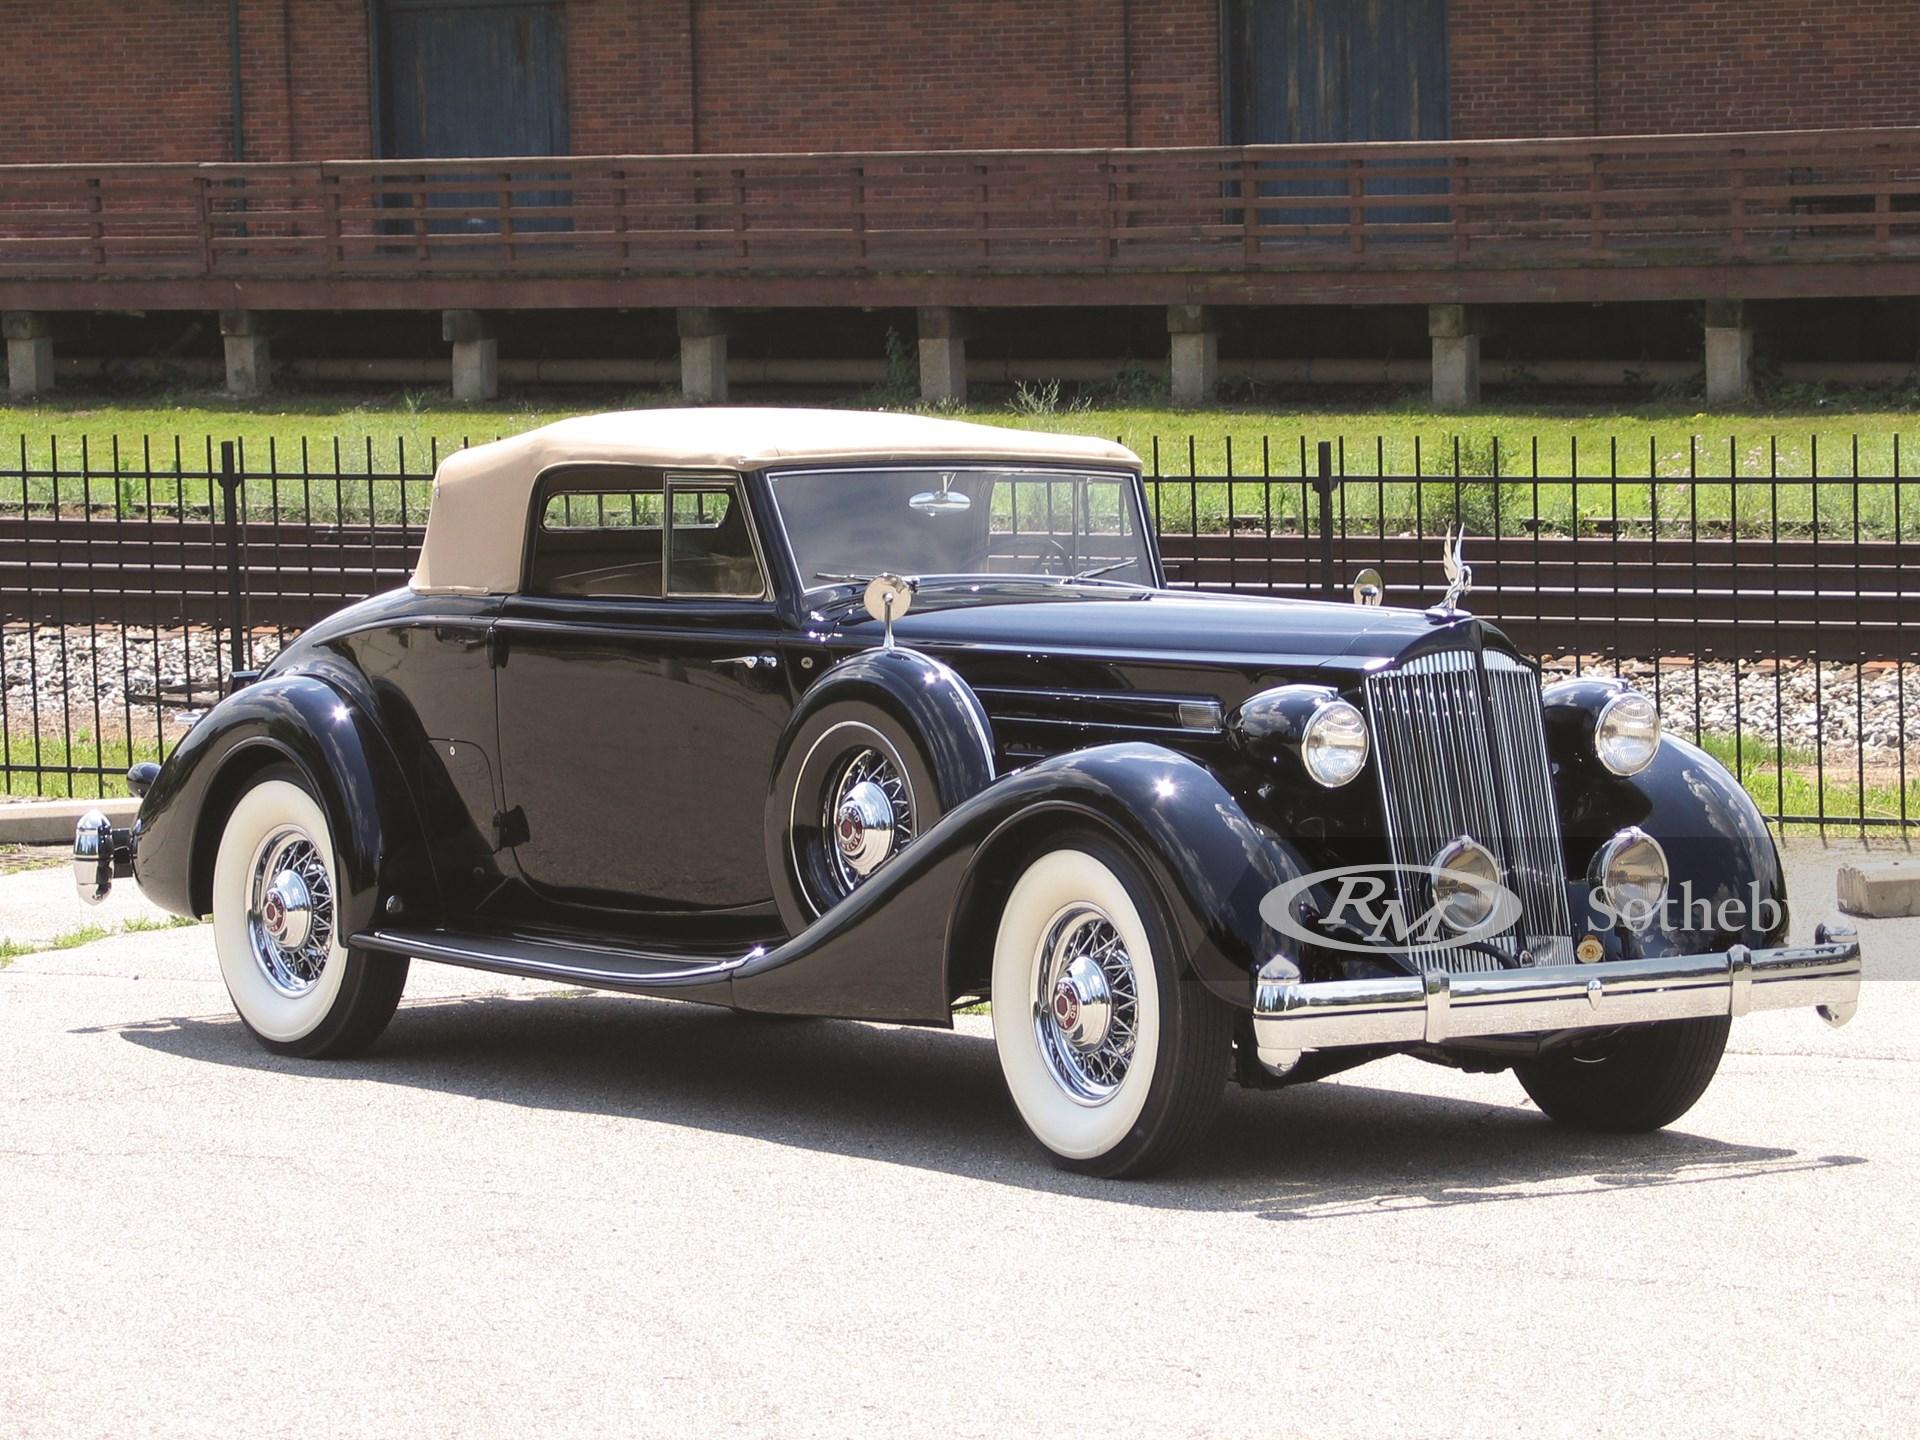 1936 Packard Twelve 2/4-Passenger Coupe Roadster